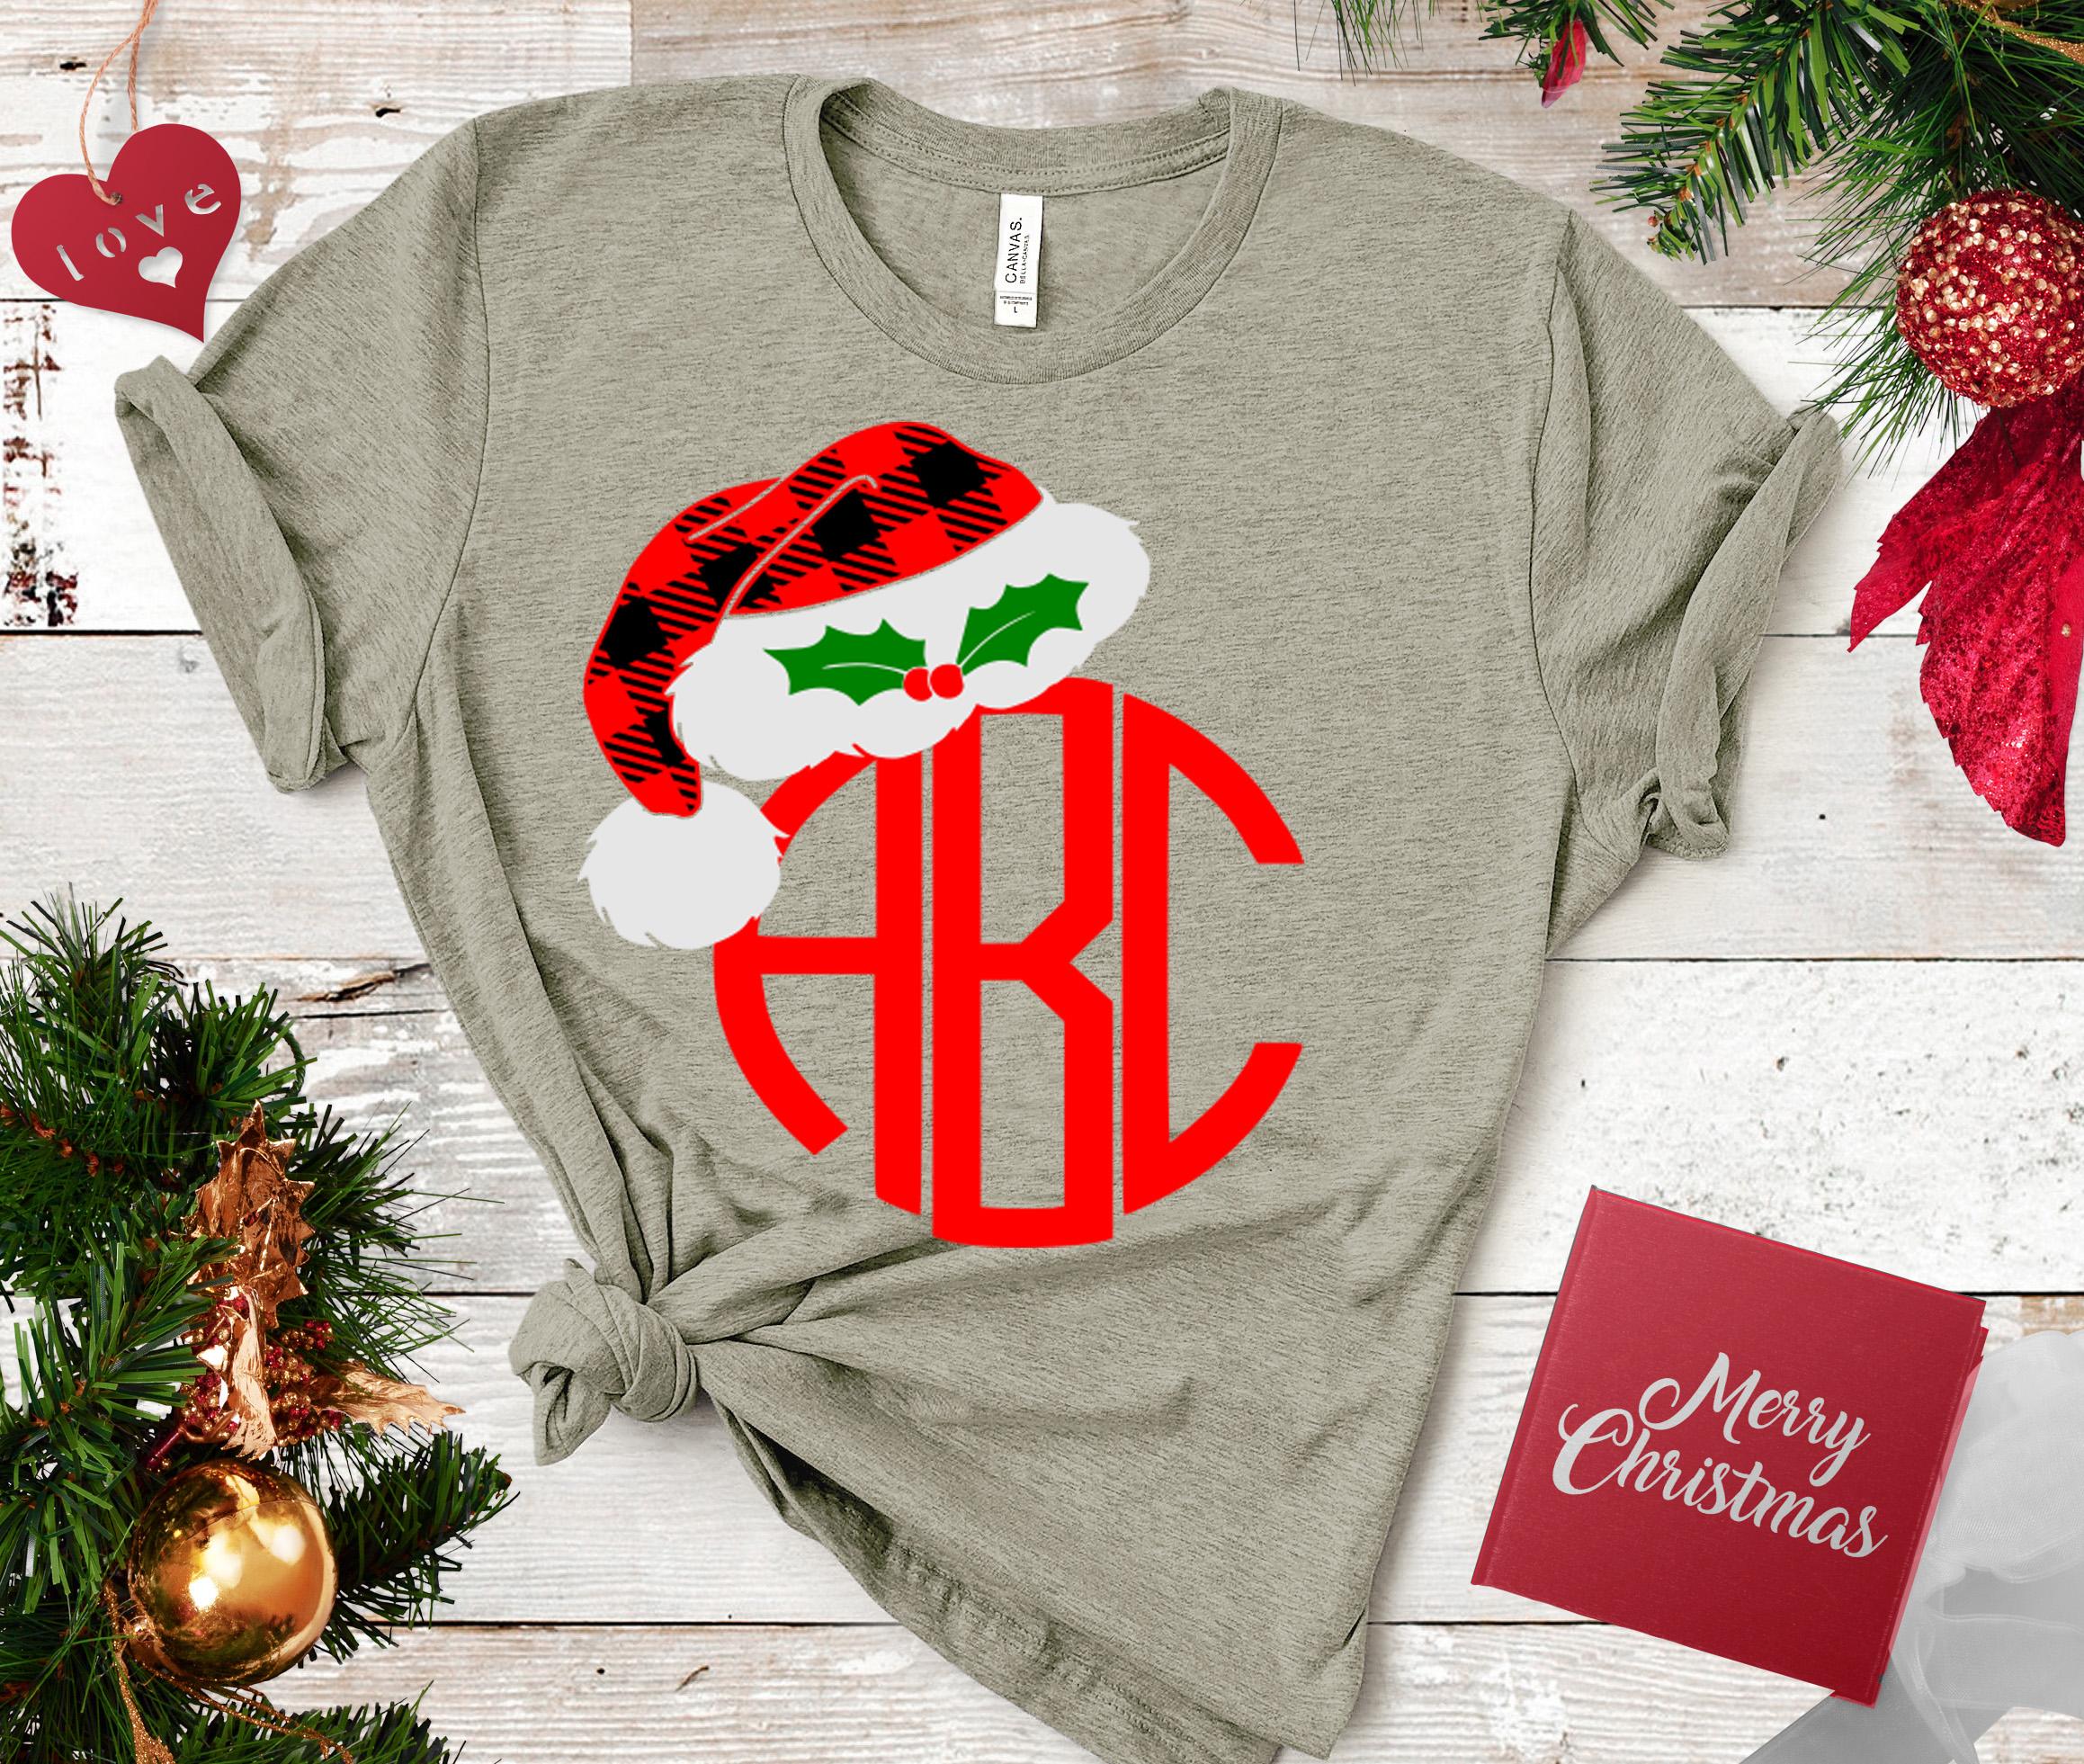 Christmas SVG - Plaid Santa Hat Monogram Frame svg example image 2